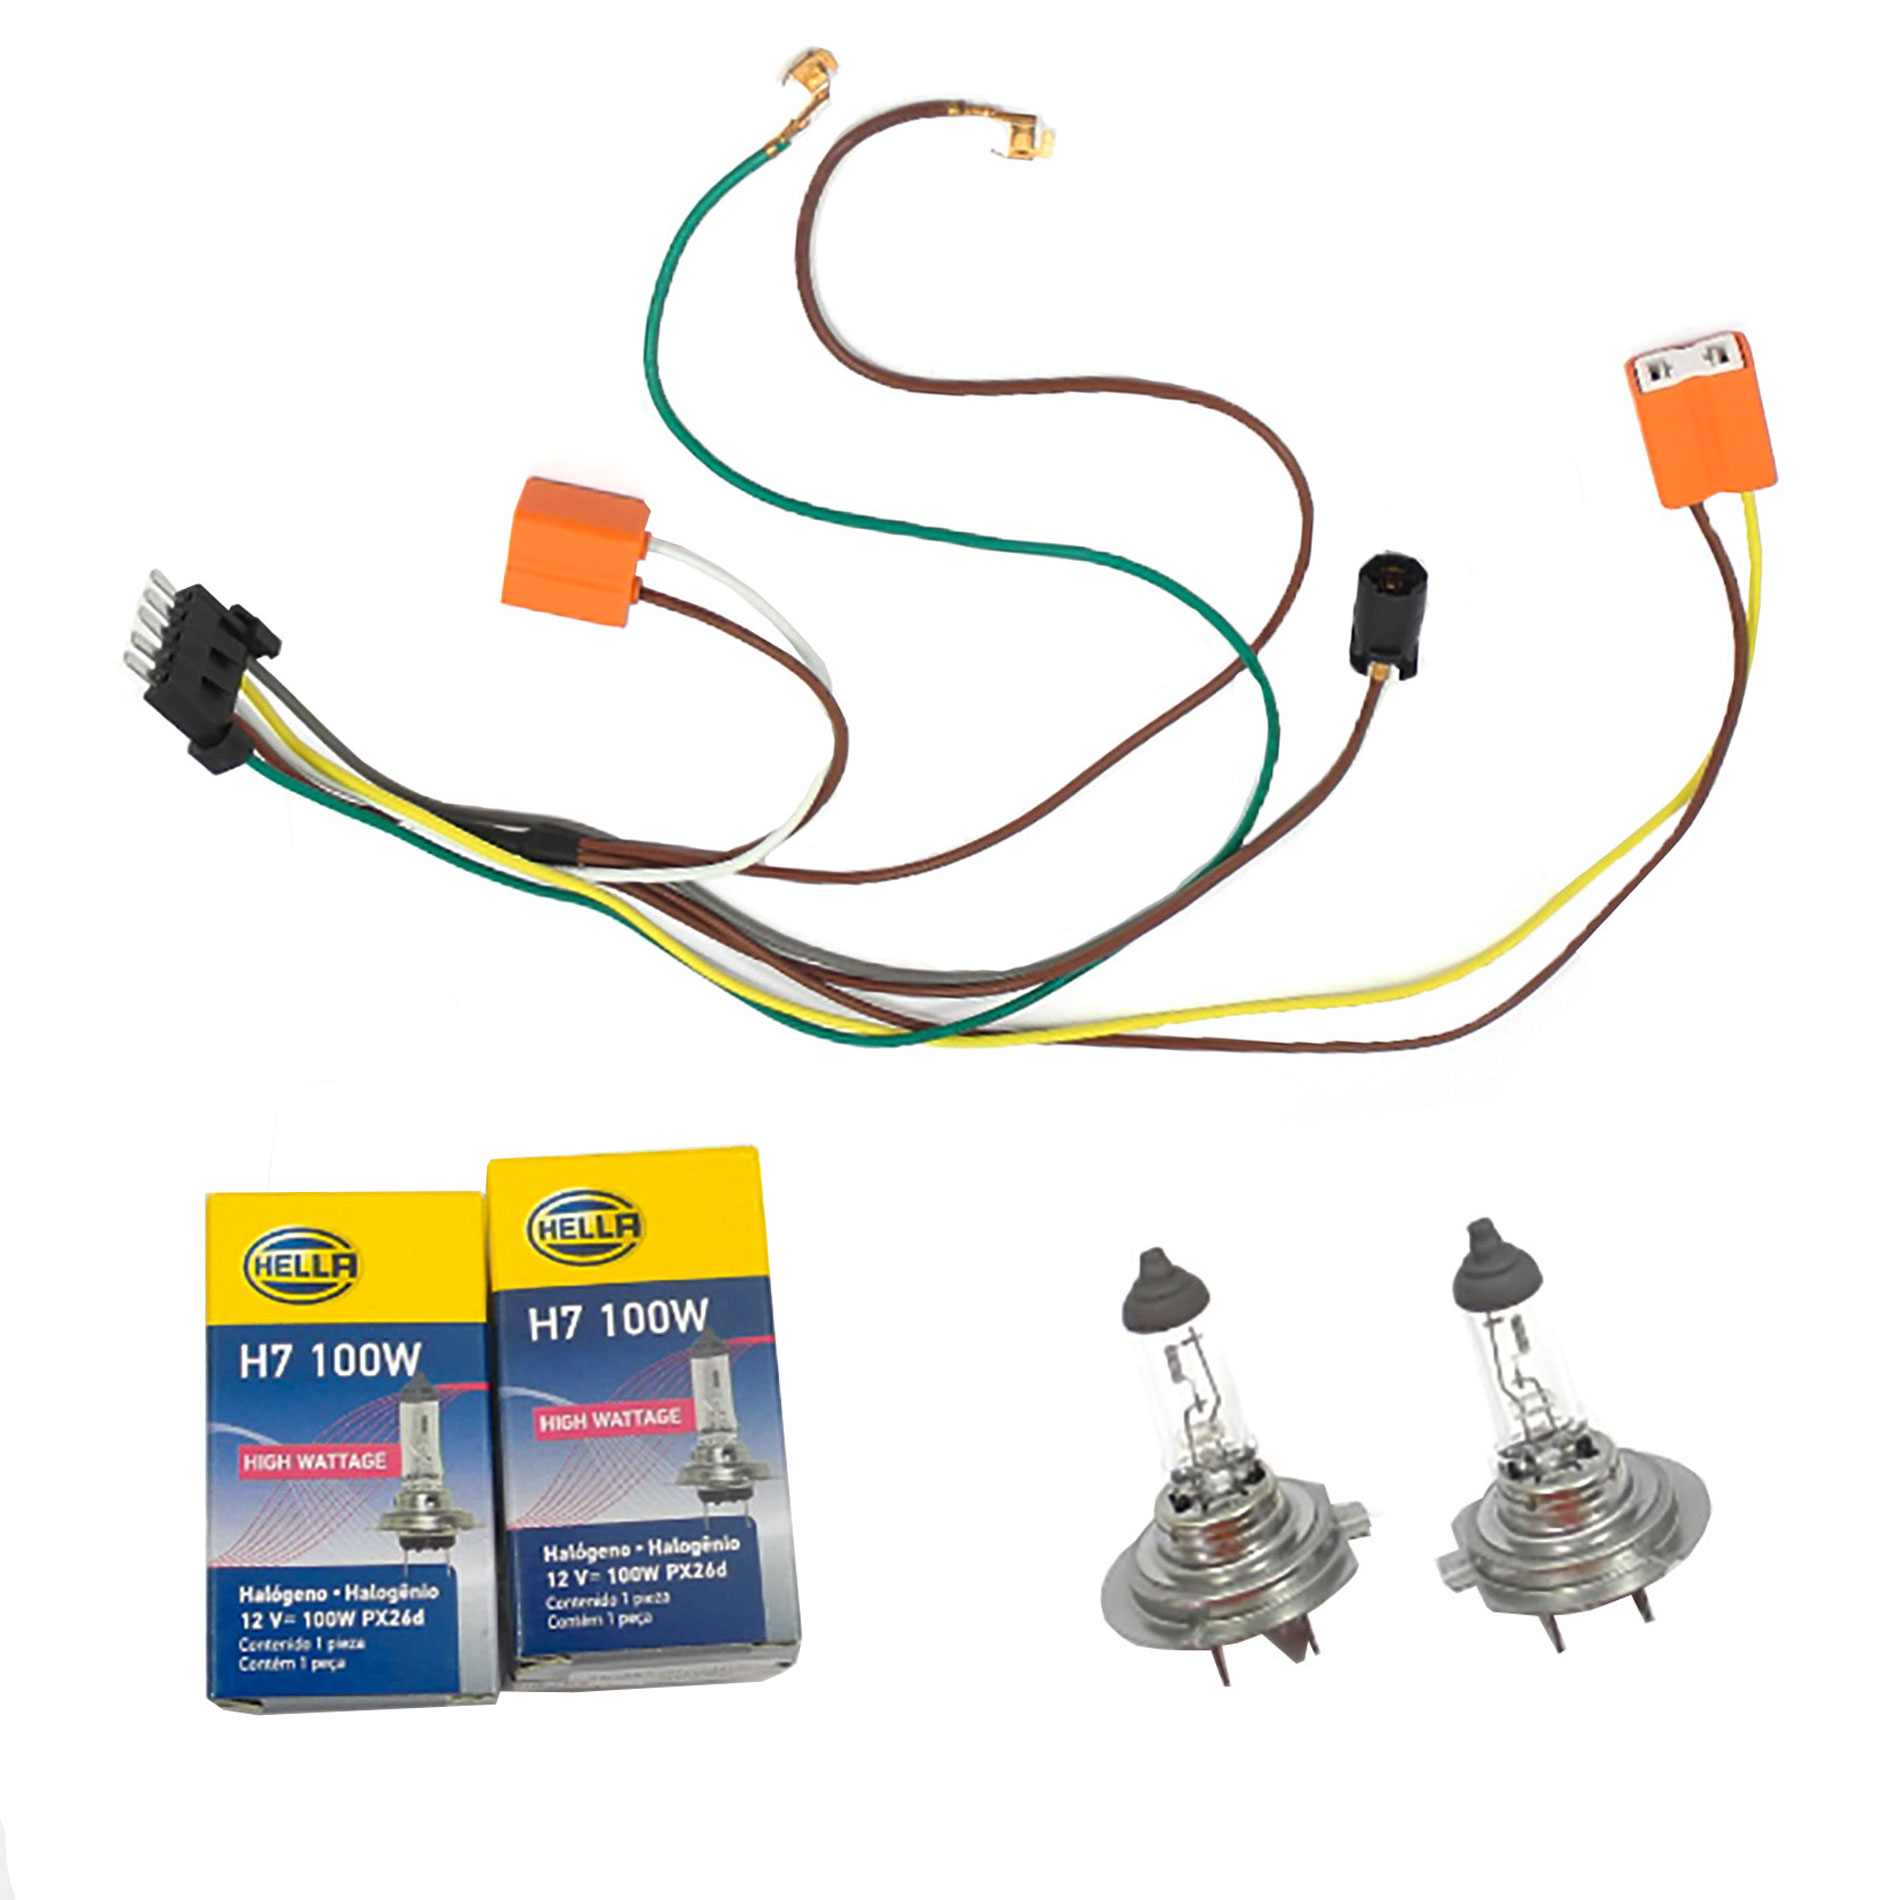 Remarkable L R Headlight Wiring Harness Headlight Bulb H7 100W For Benz C32 Wiring Digital Resources Anistprontobusorg